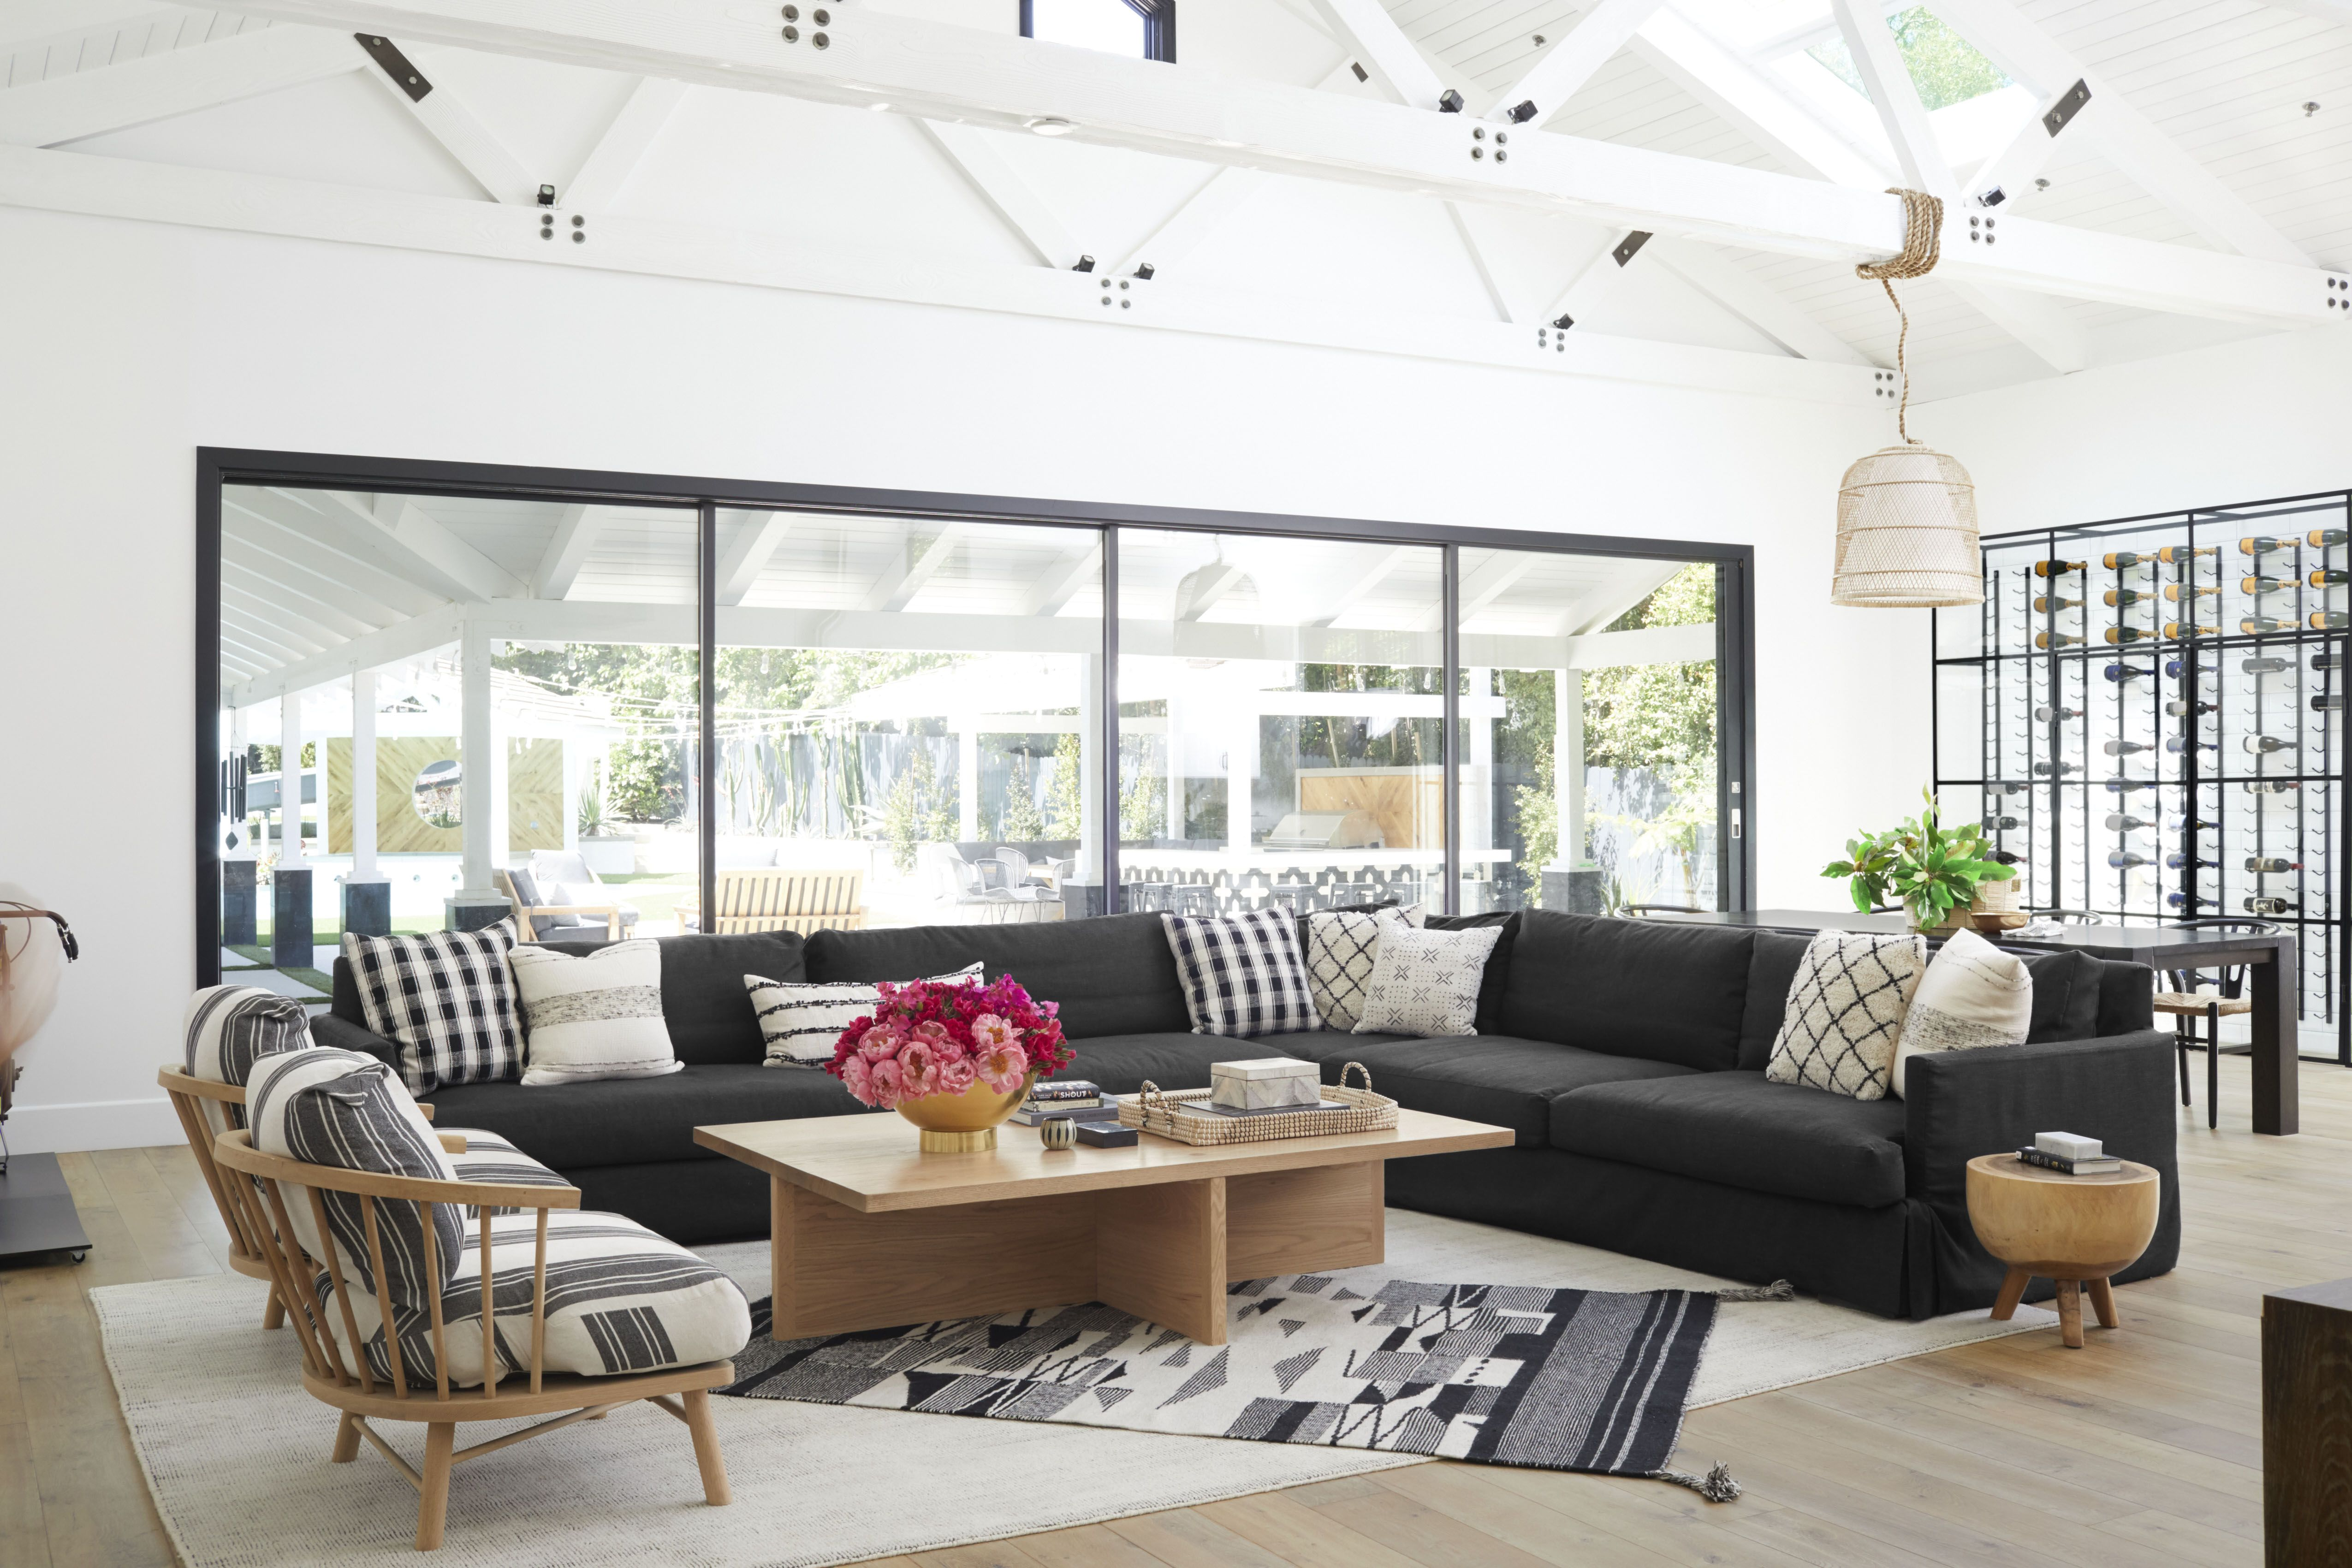 Christina Anstead's Bohemian Modern Farmhouse Is a California Dream